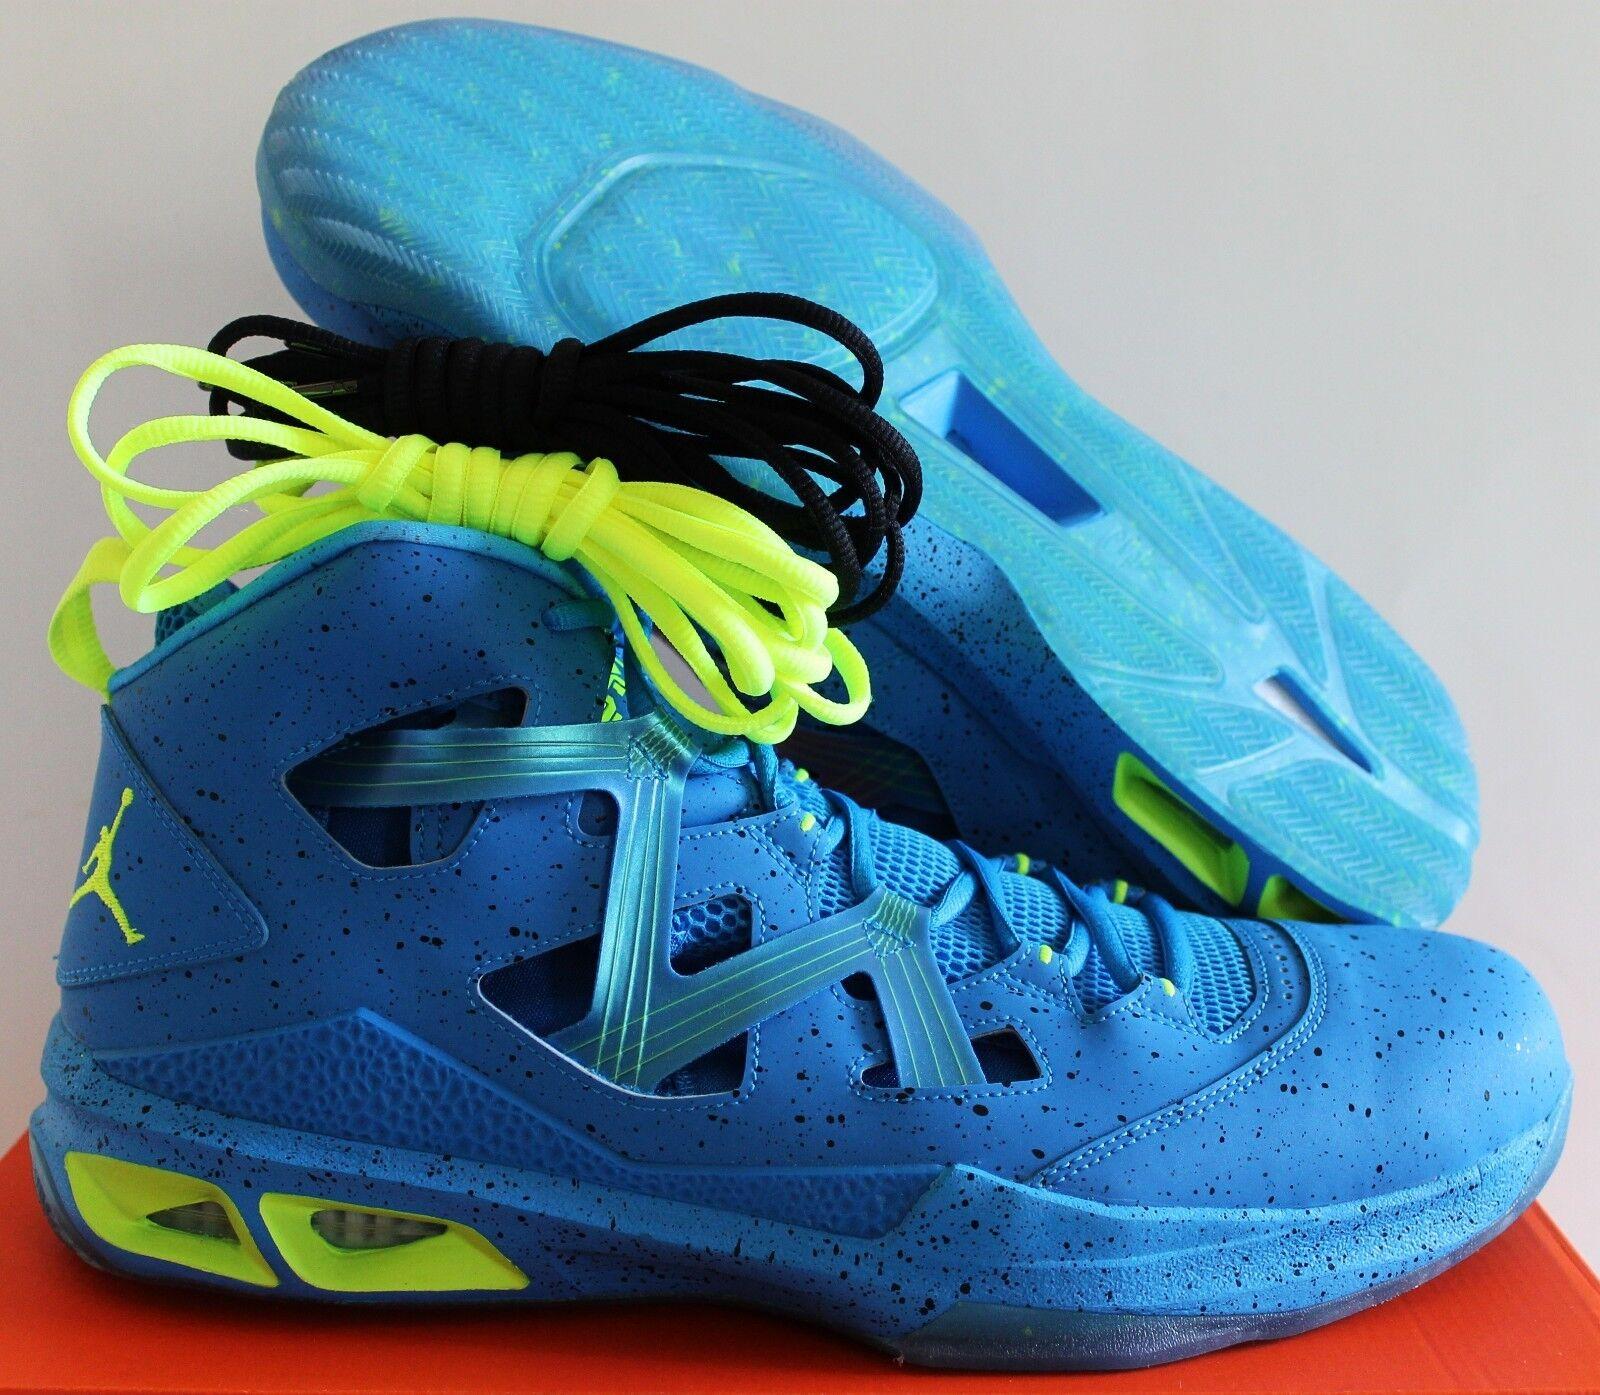 Nike Air Jordan MELO [579592 M9 BHM BHM Foto Azul [579592 MELO 423] c6ae6f